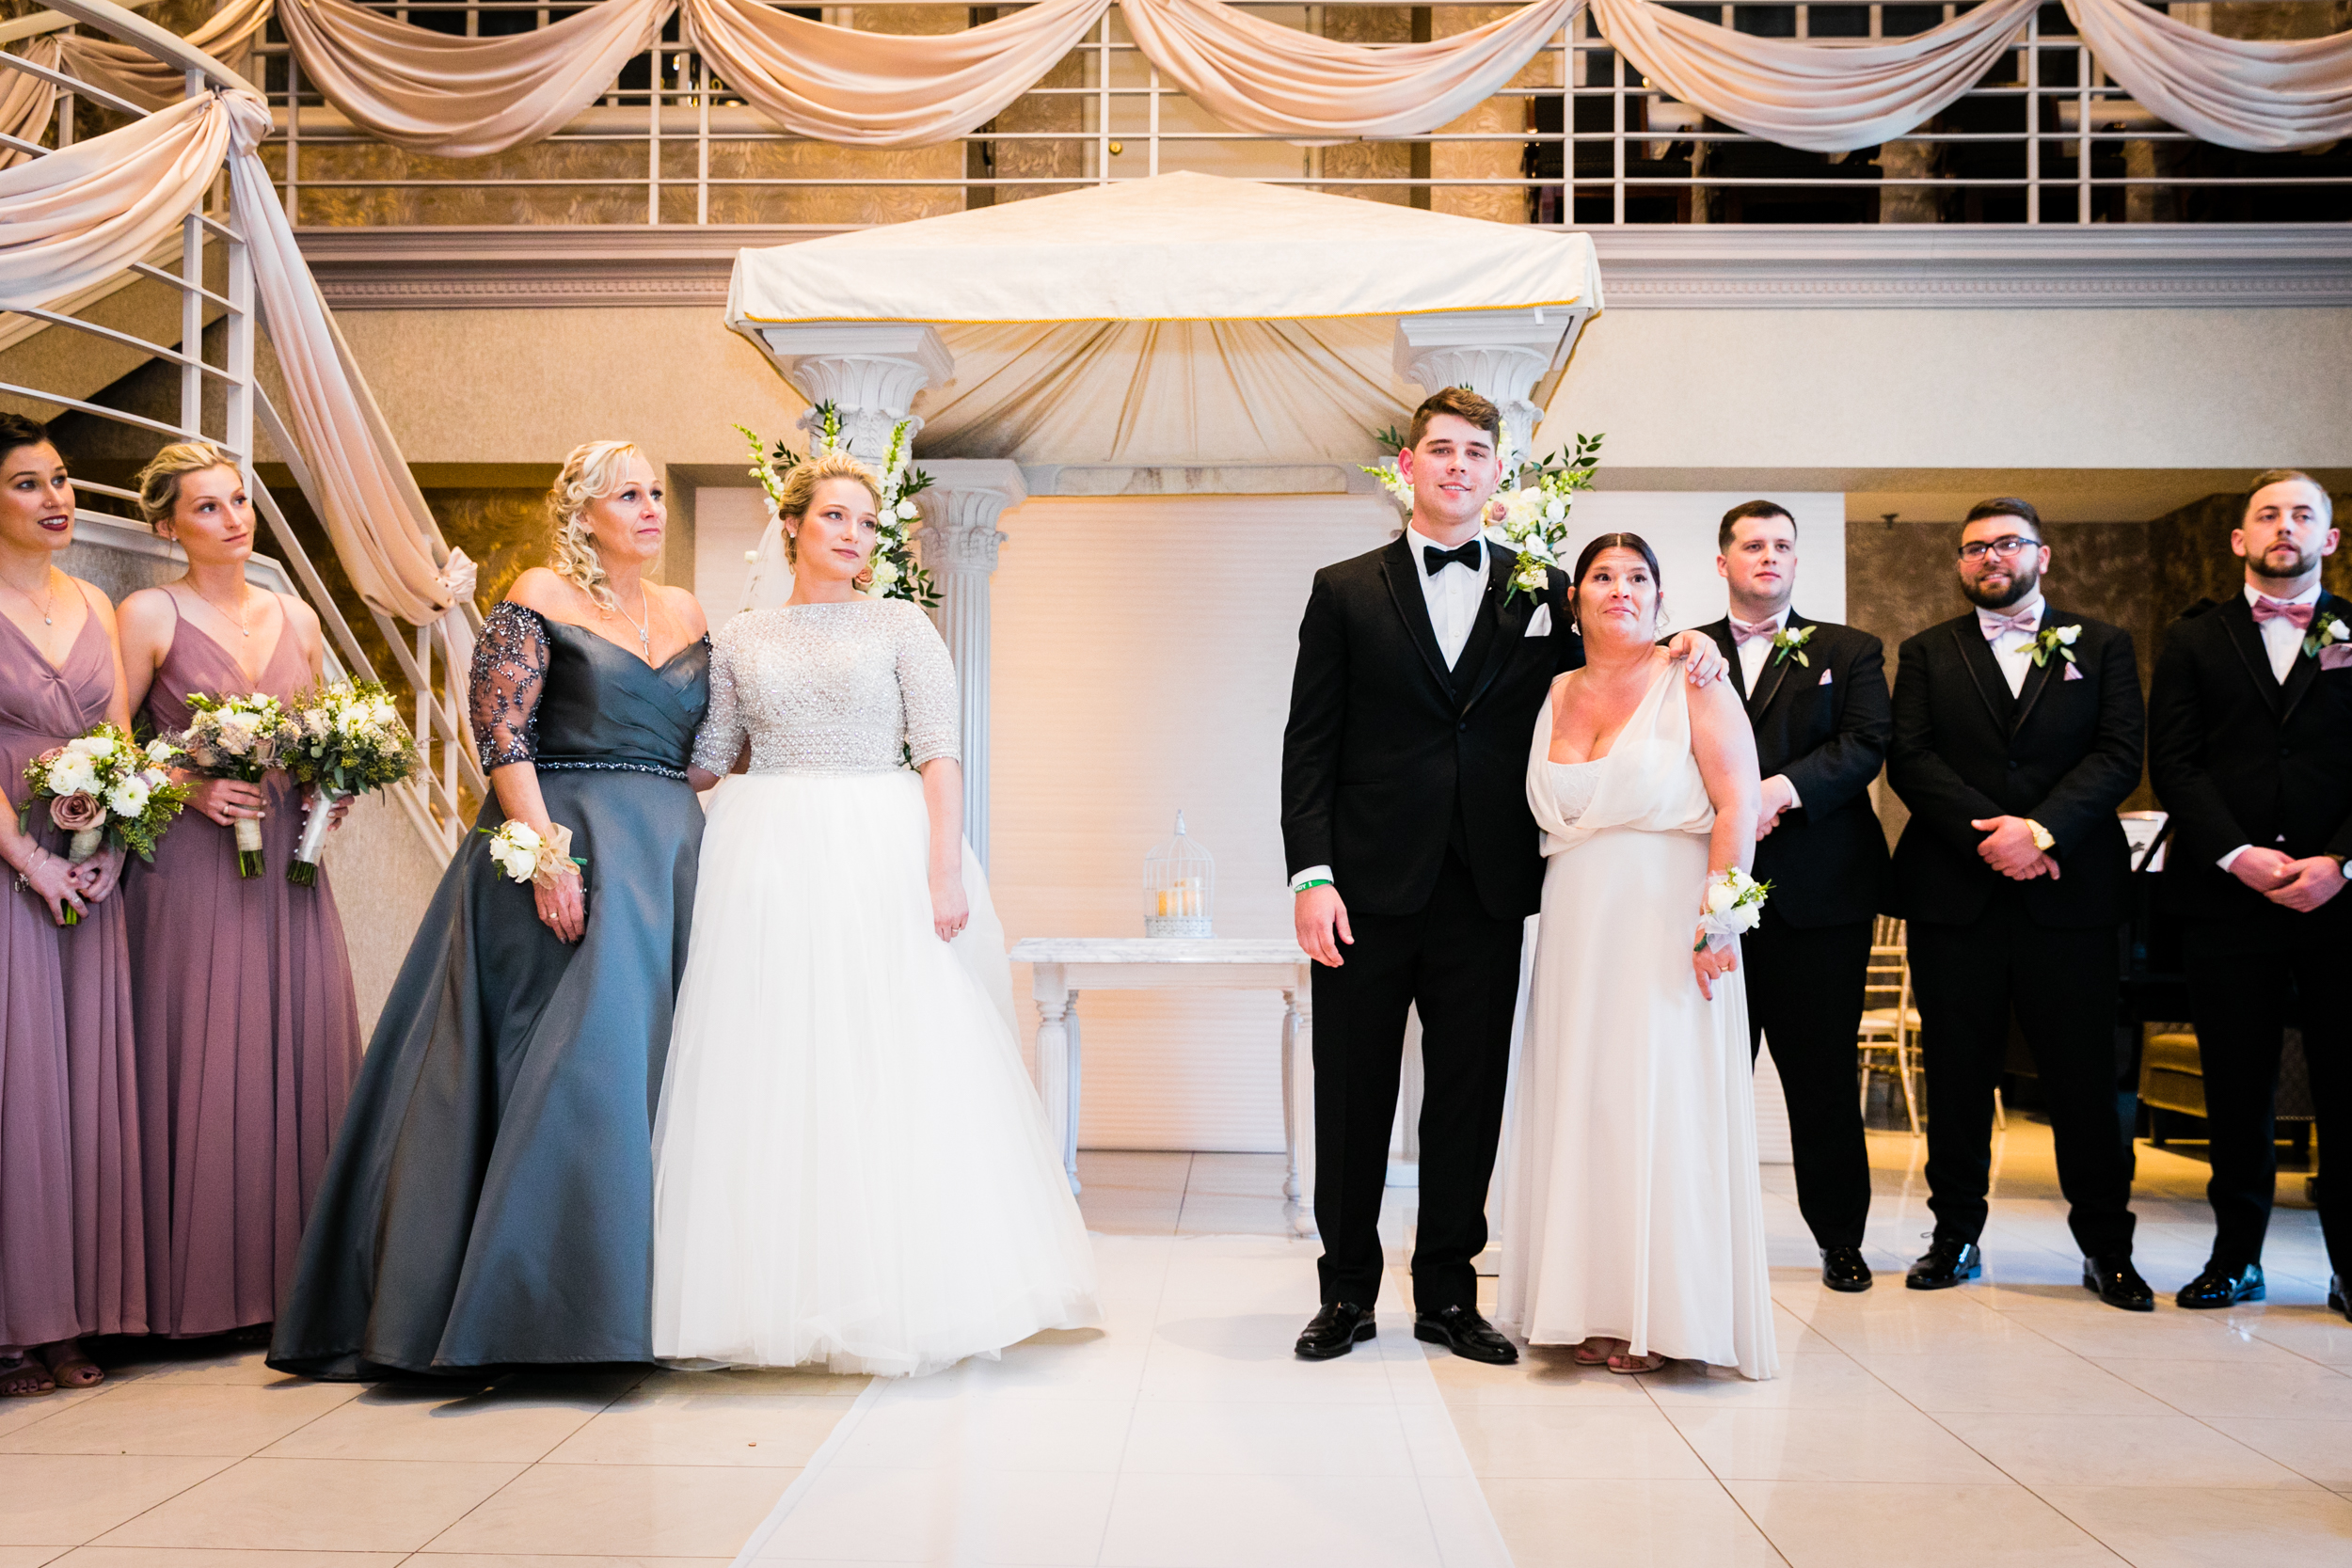 CELEBRATIONS BENSALEM WEDDING PHOTOGRAPHY-55.jpg